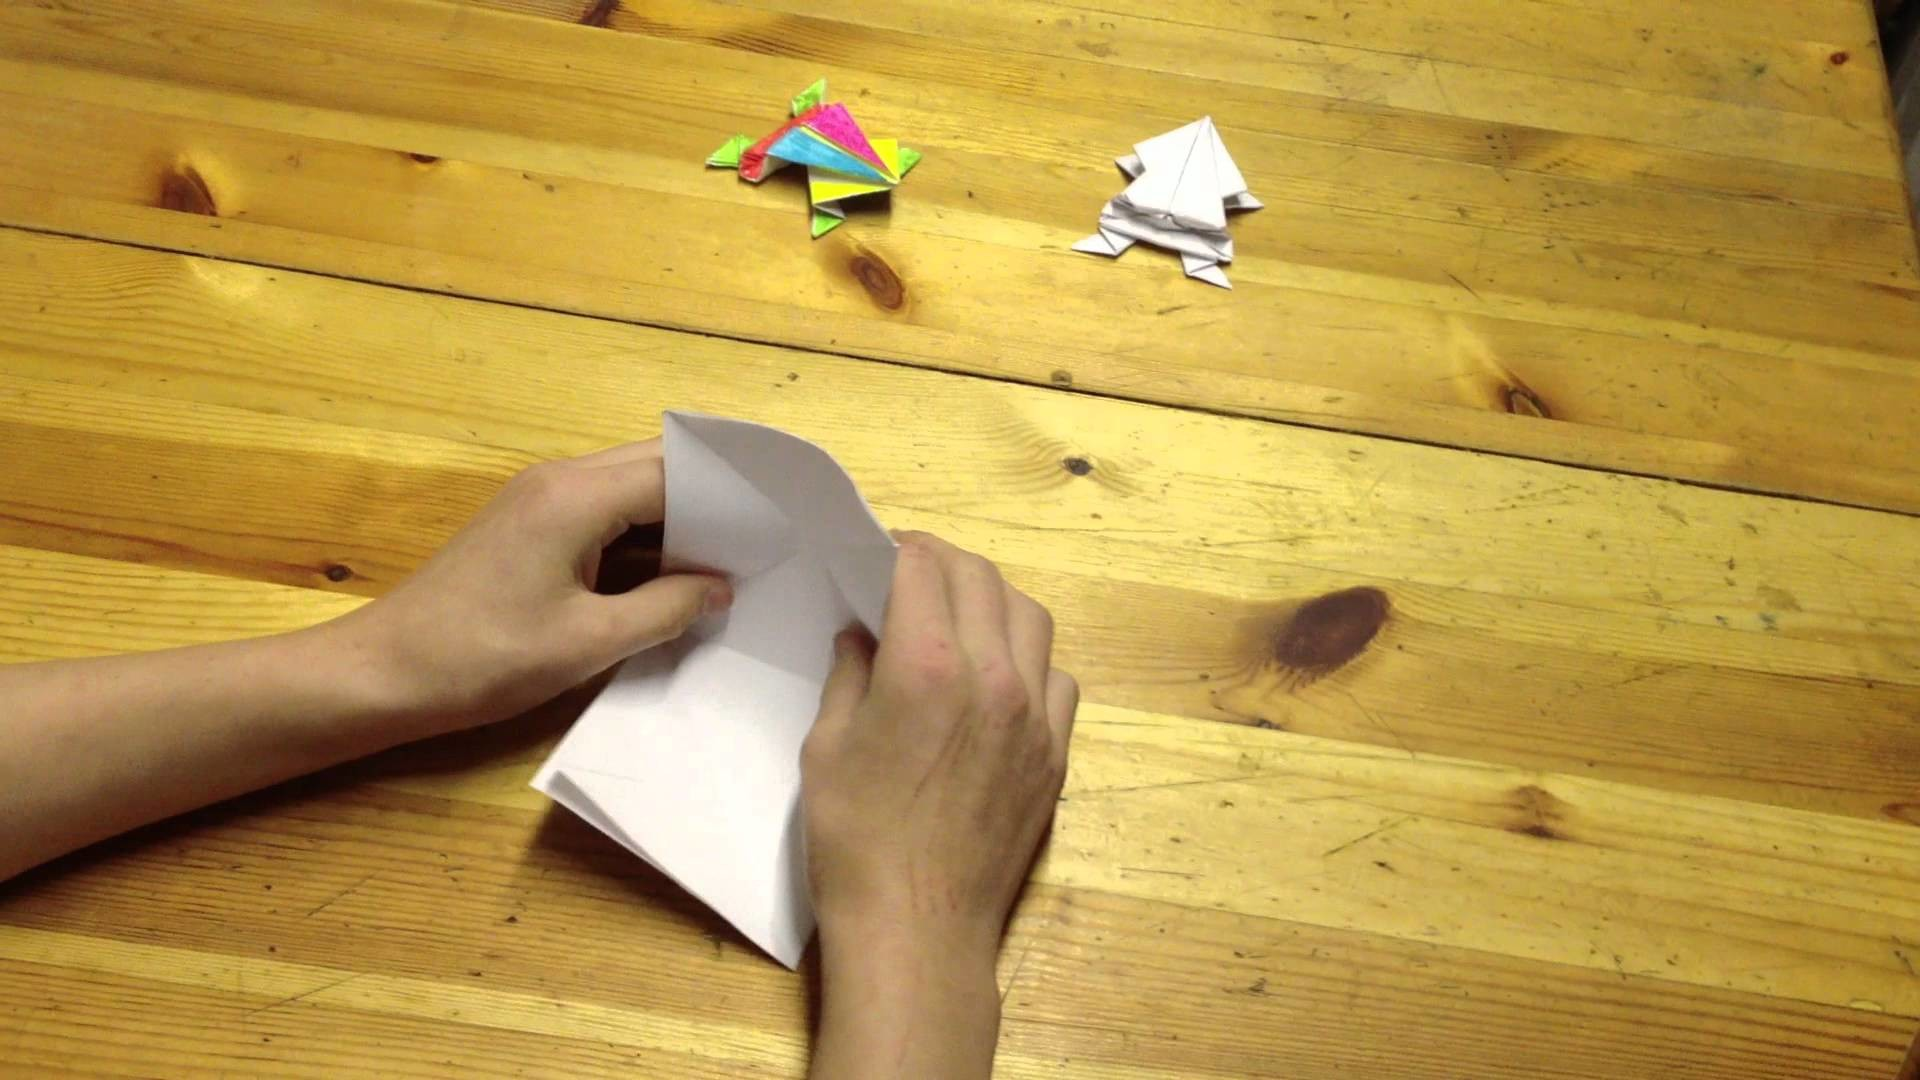 Faire une grenouille  en papier - Tutoriel grenouille en origami: Astuce origami facile